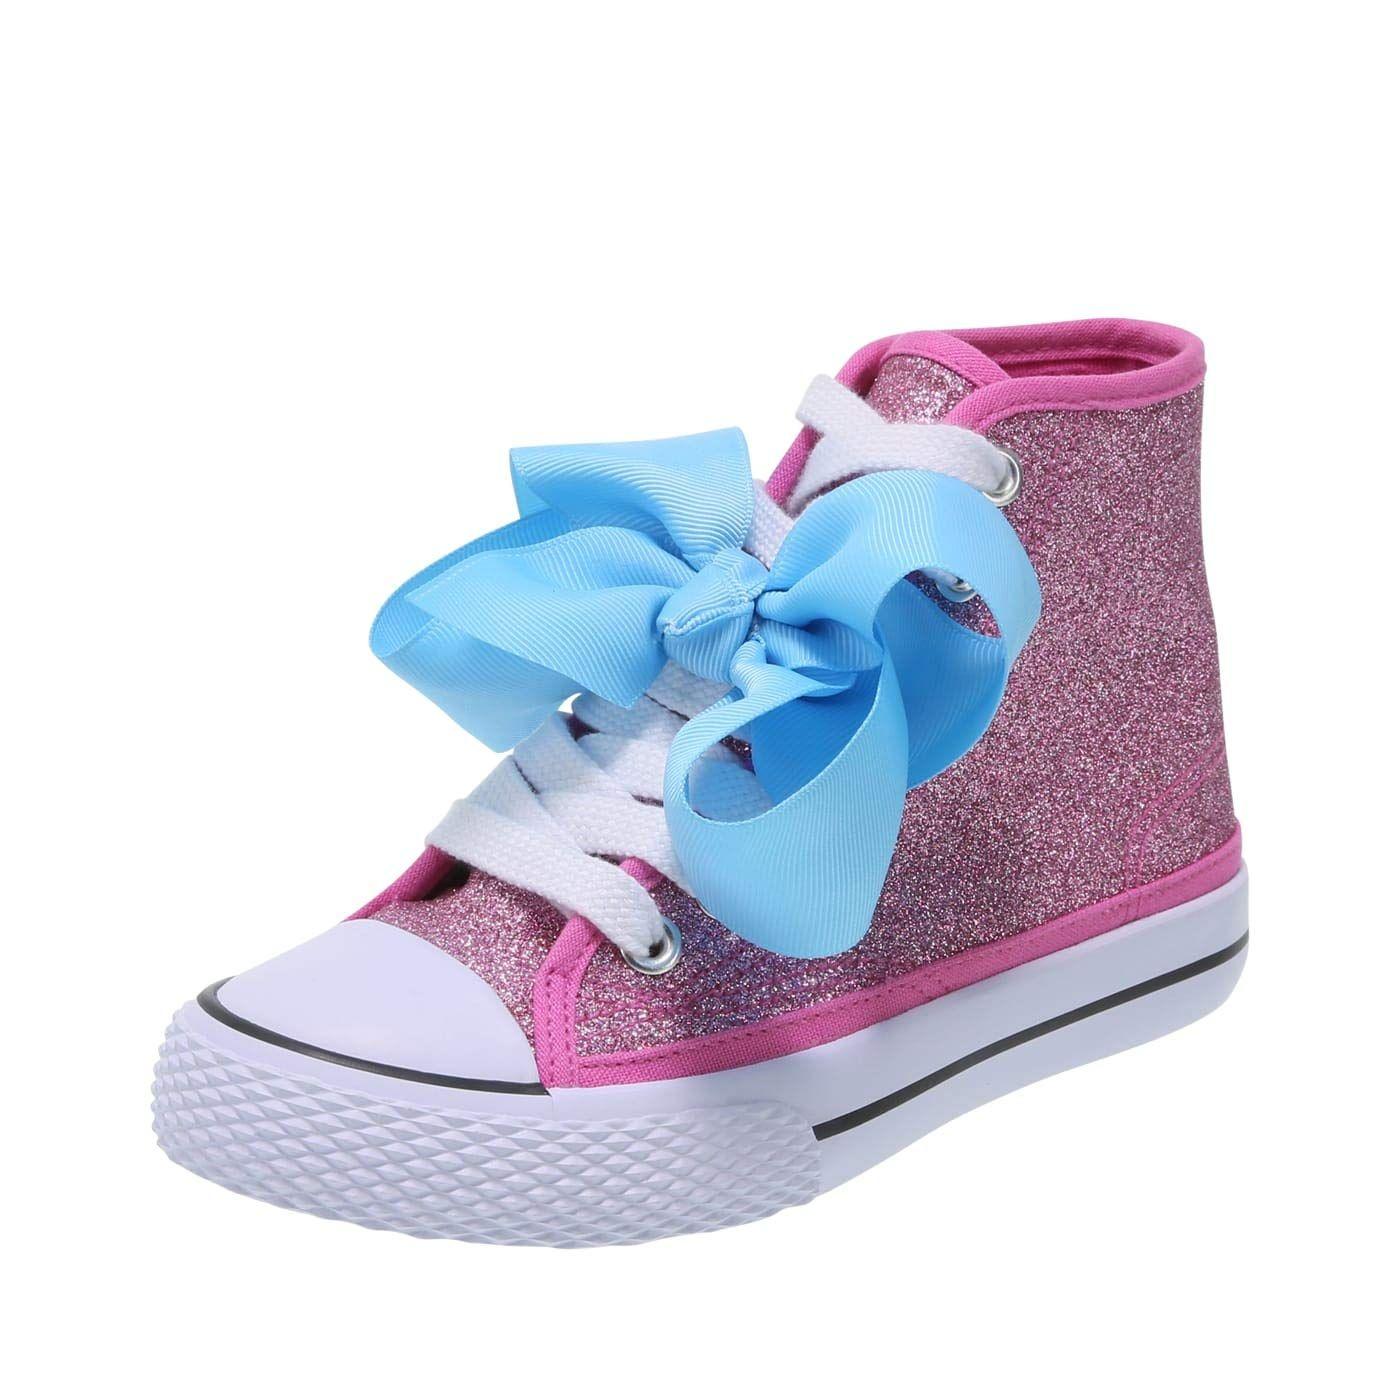 Nicklodeon Shoes JoJo Siwa Pink Glitter